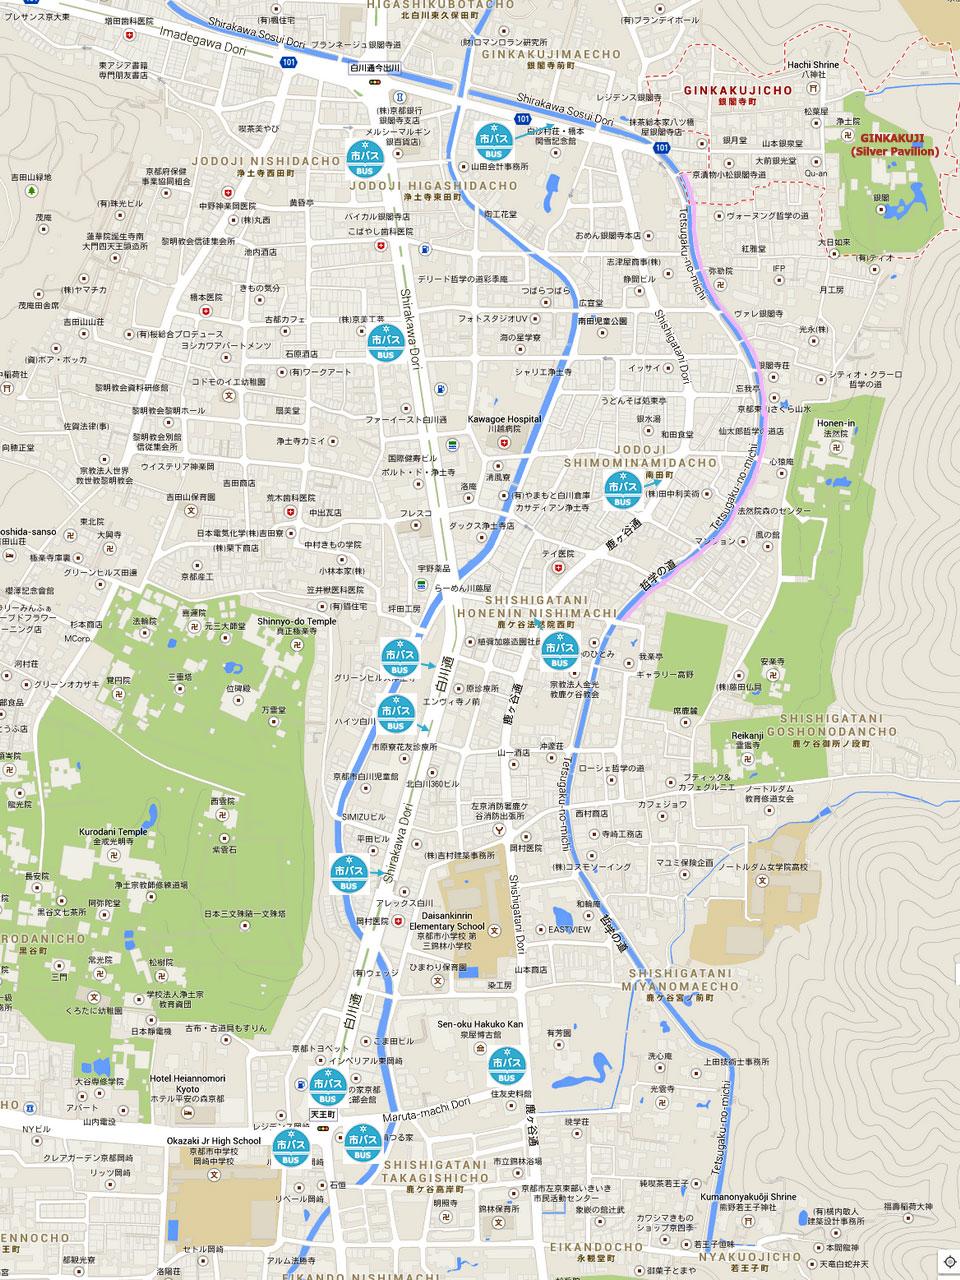 Japanese Subway Map.Top 10 Punto Medio Noticias Tokyo Subway Map